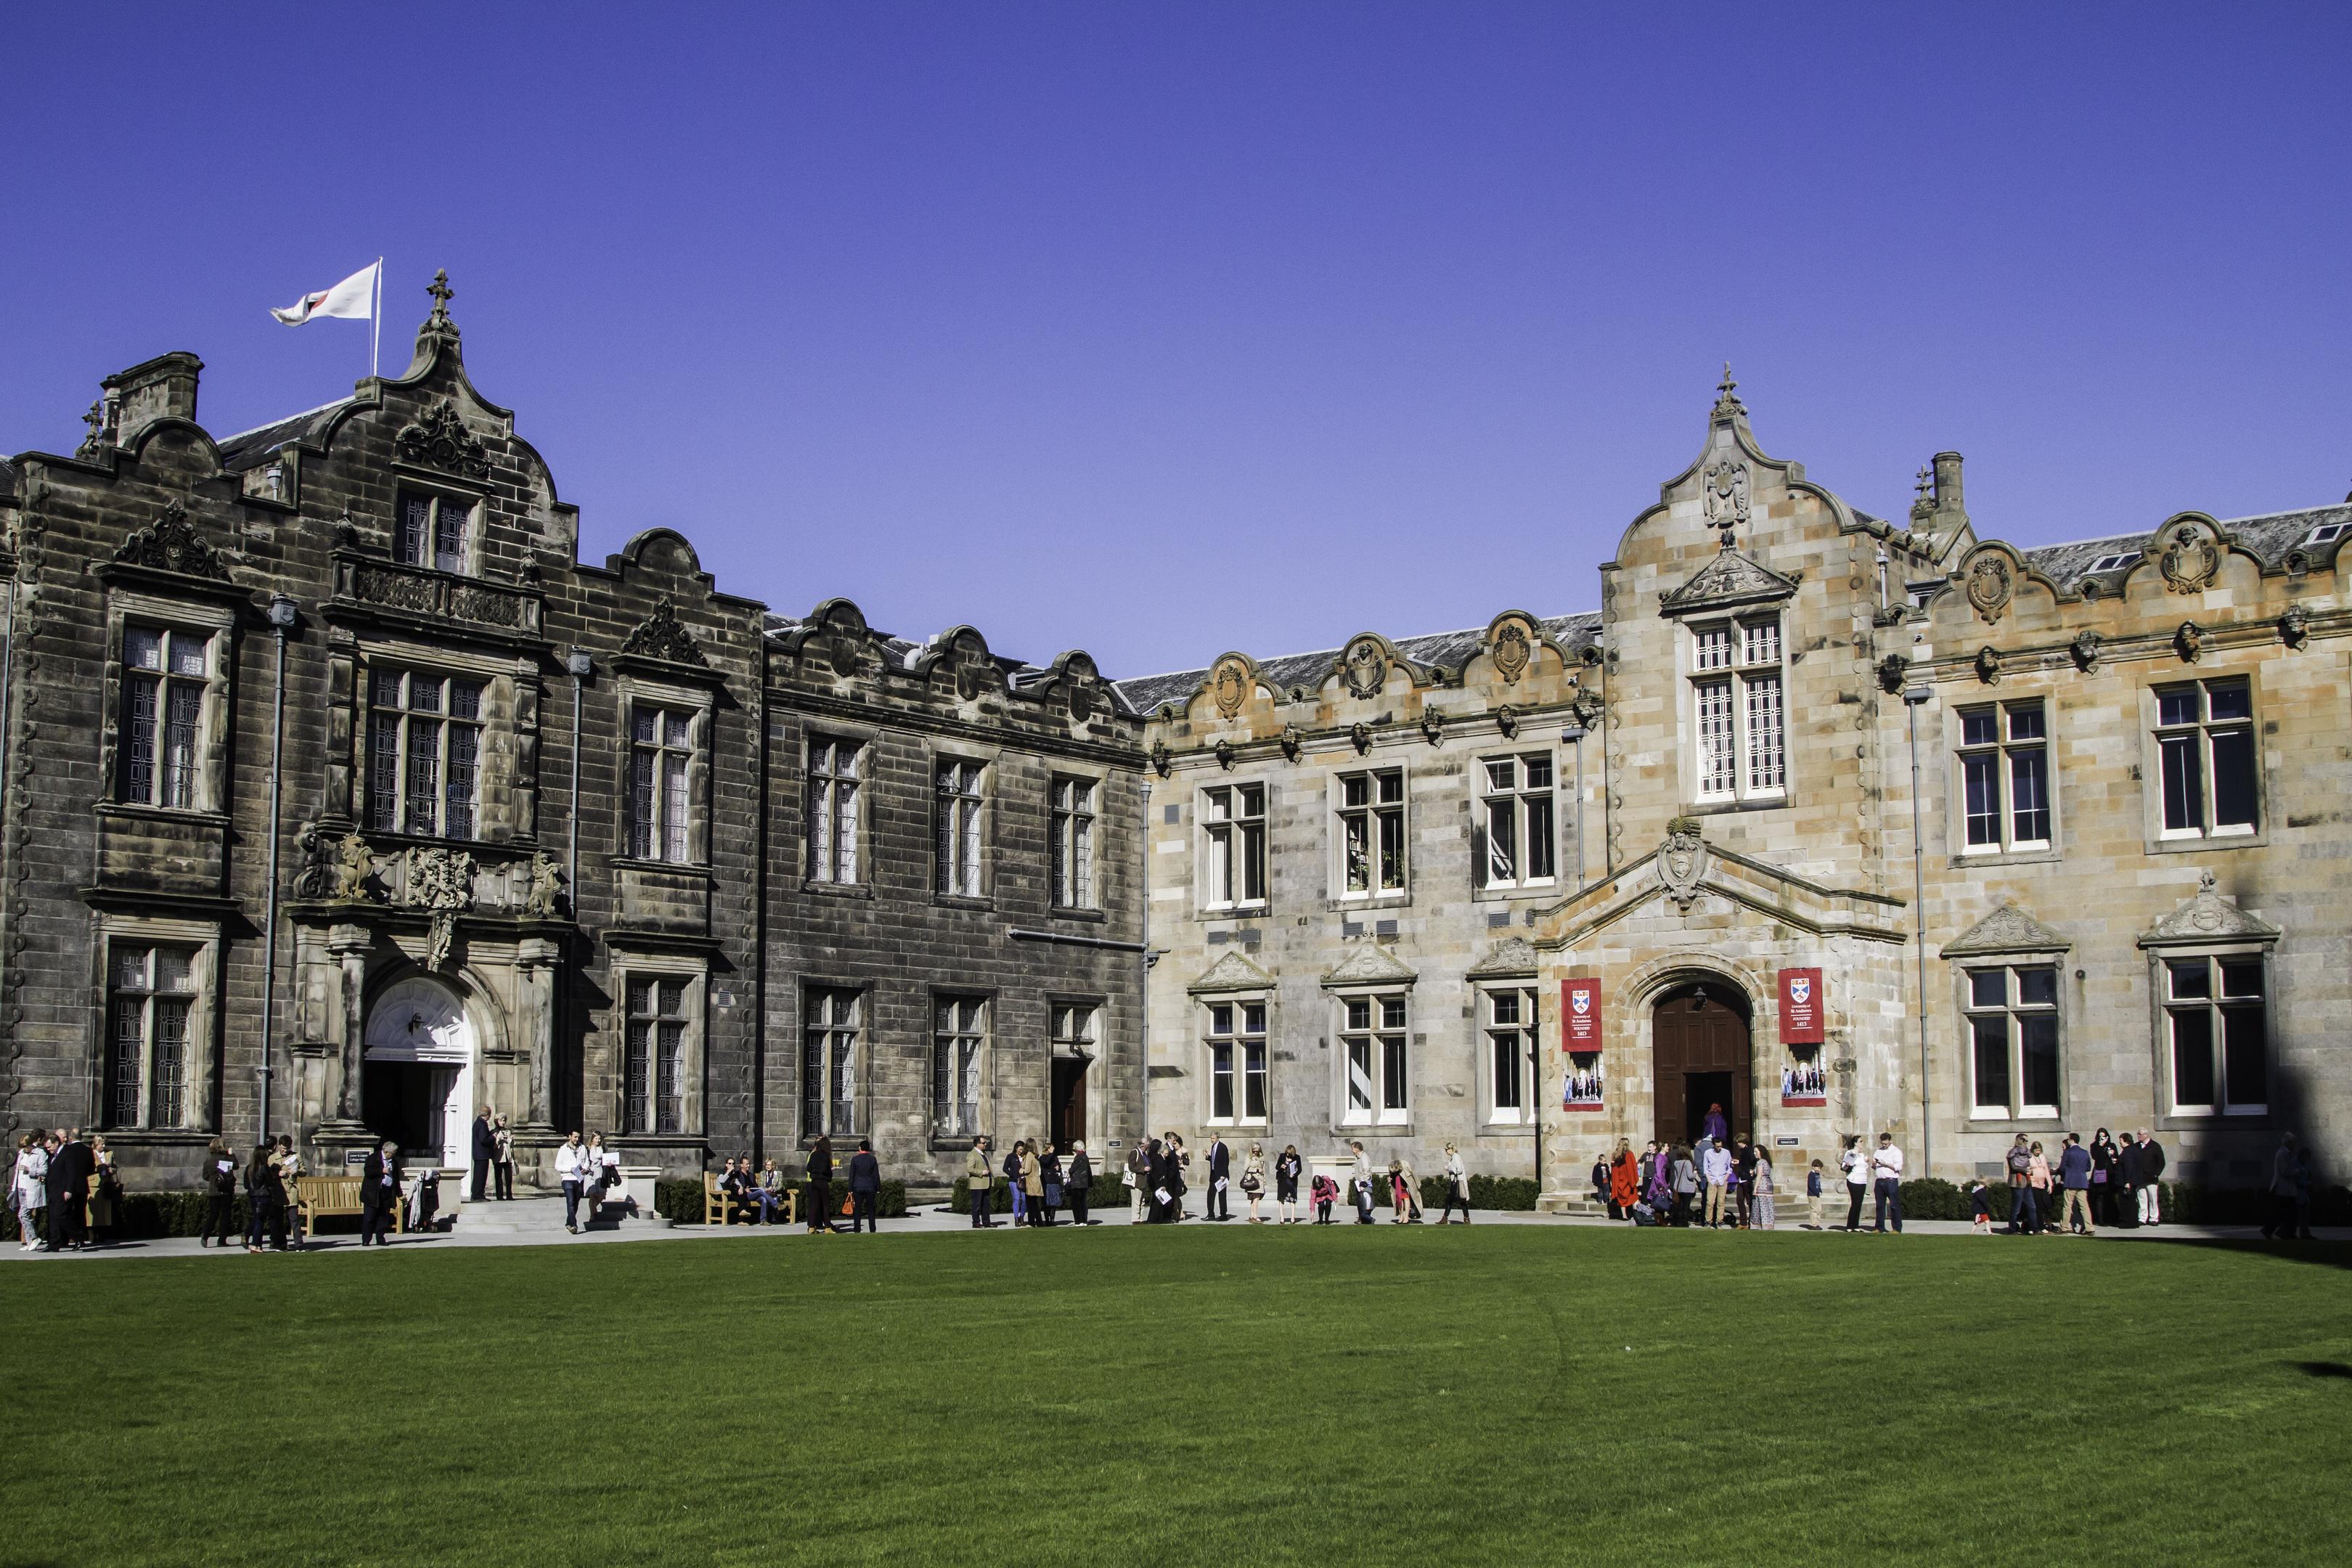 The University of St Andrews